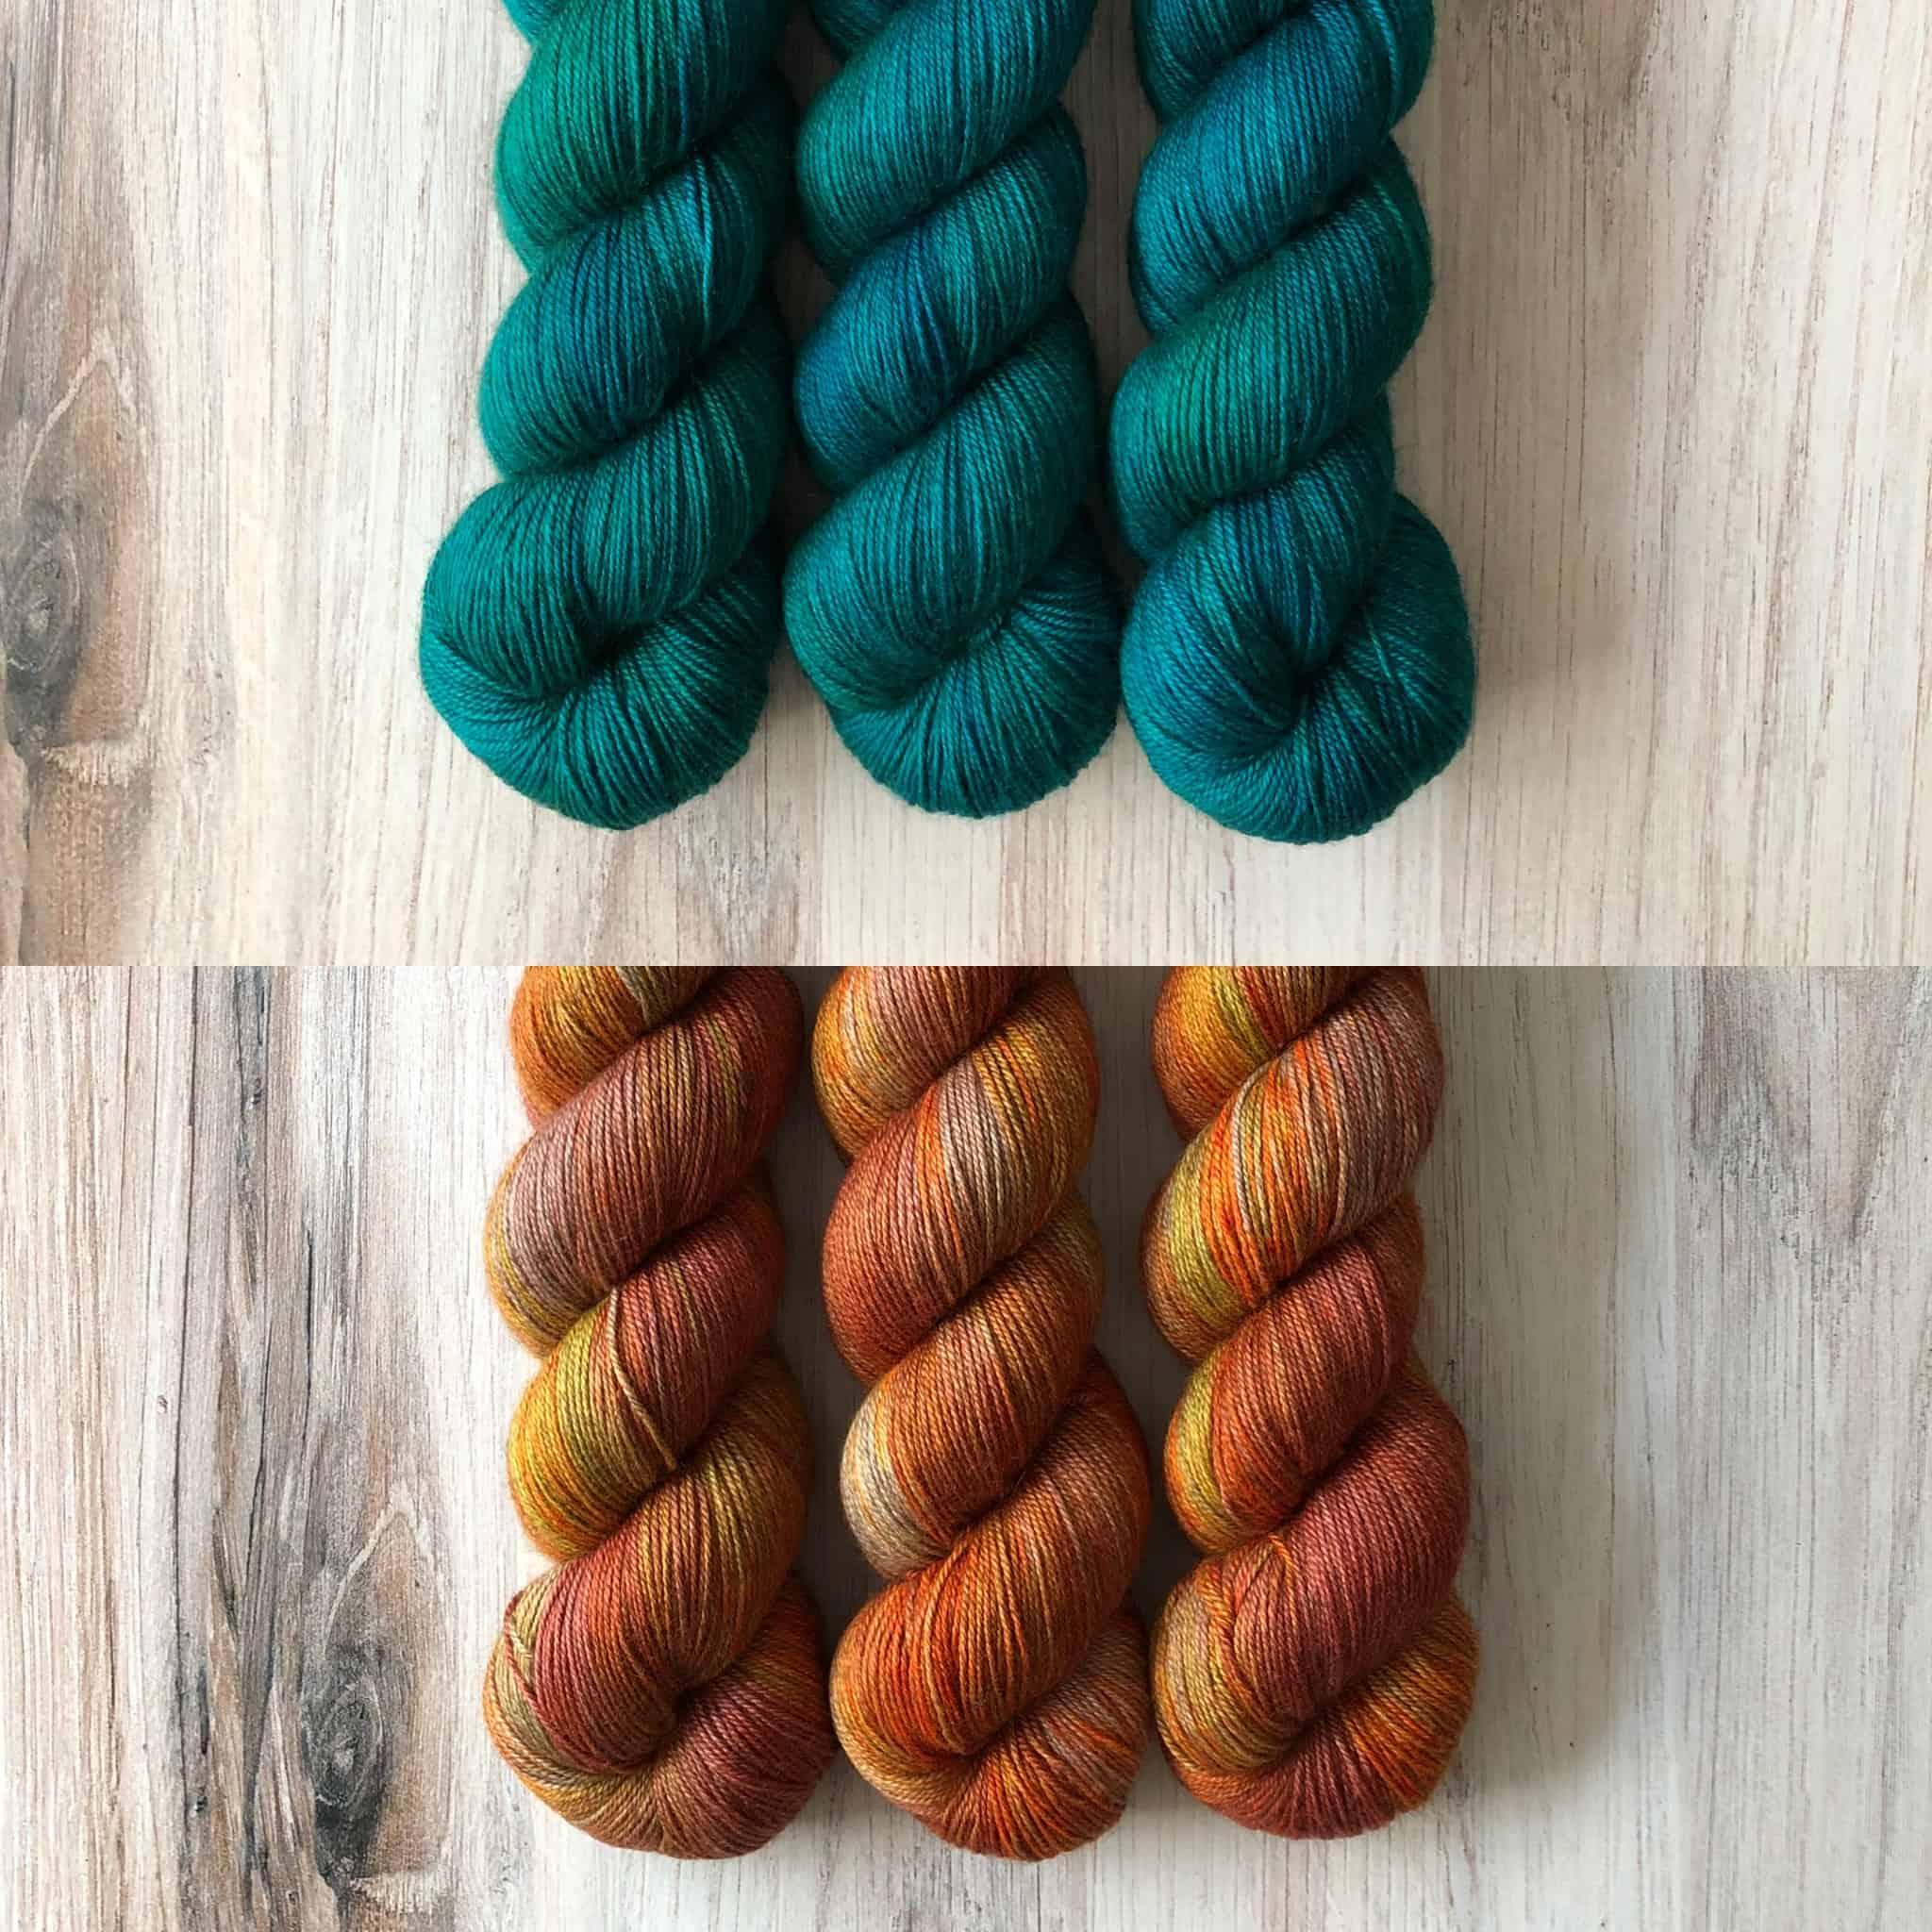 Teal and orange yarn.